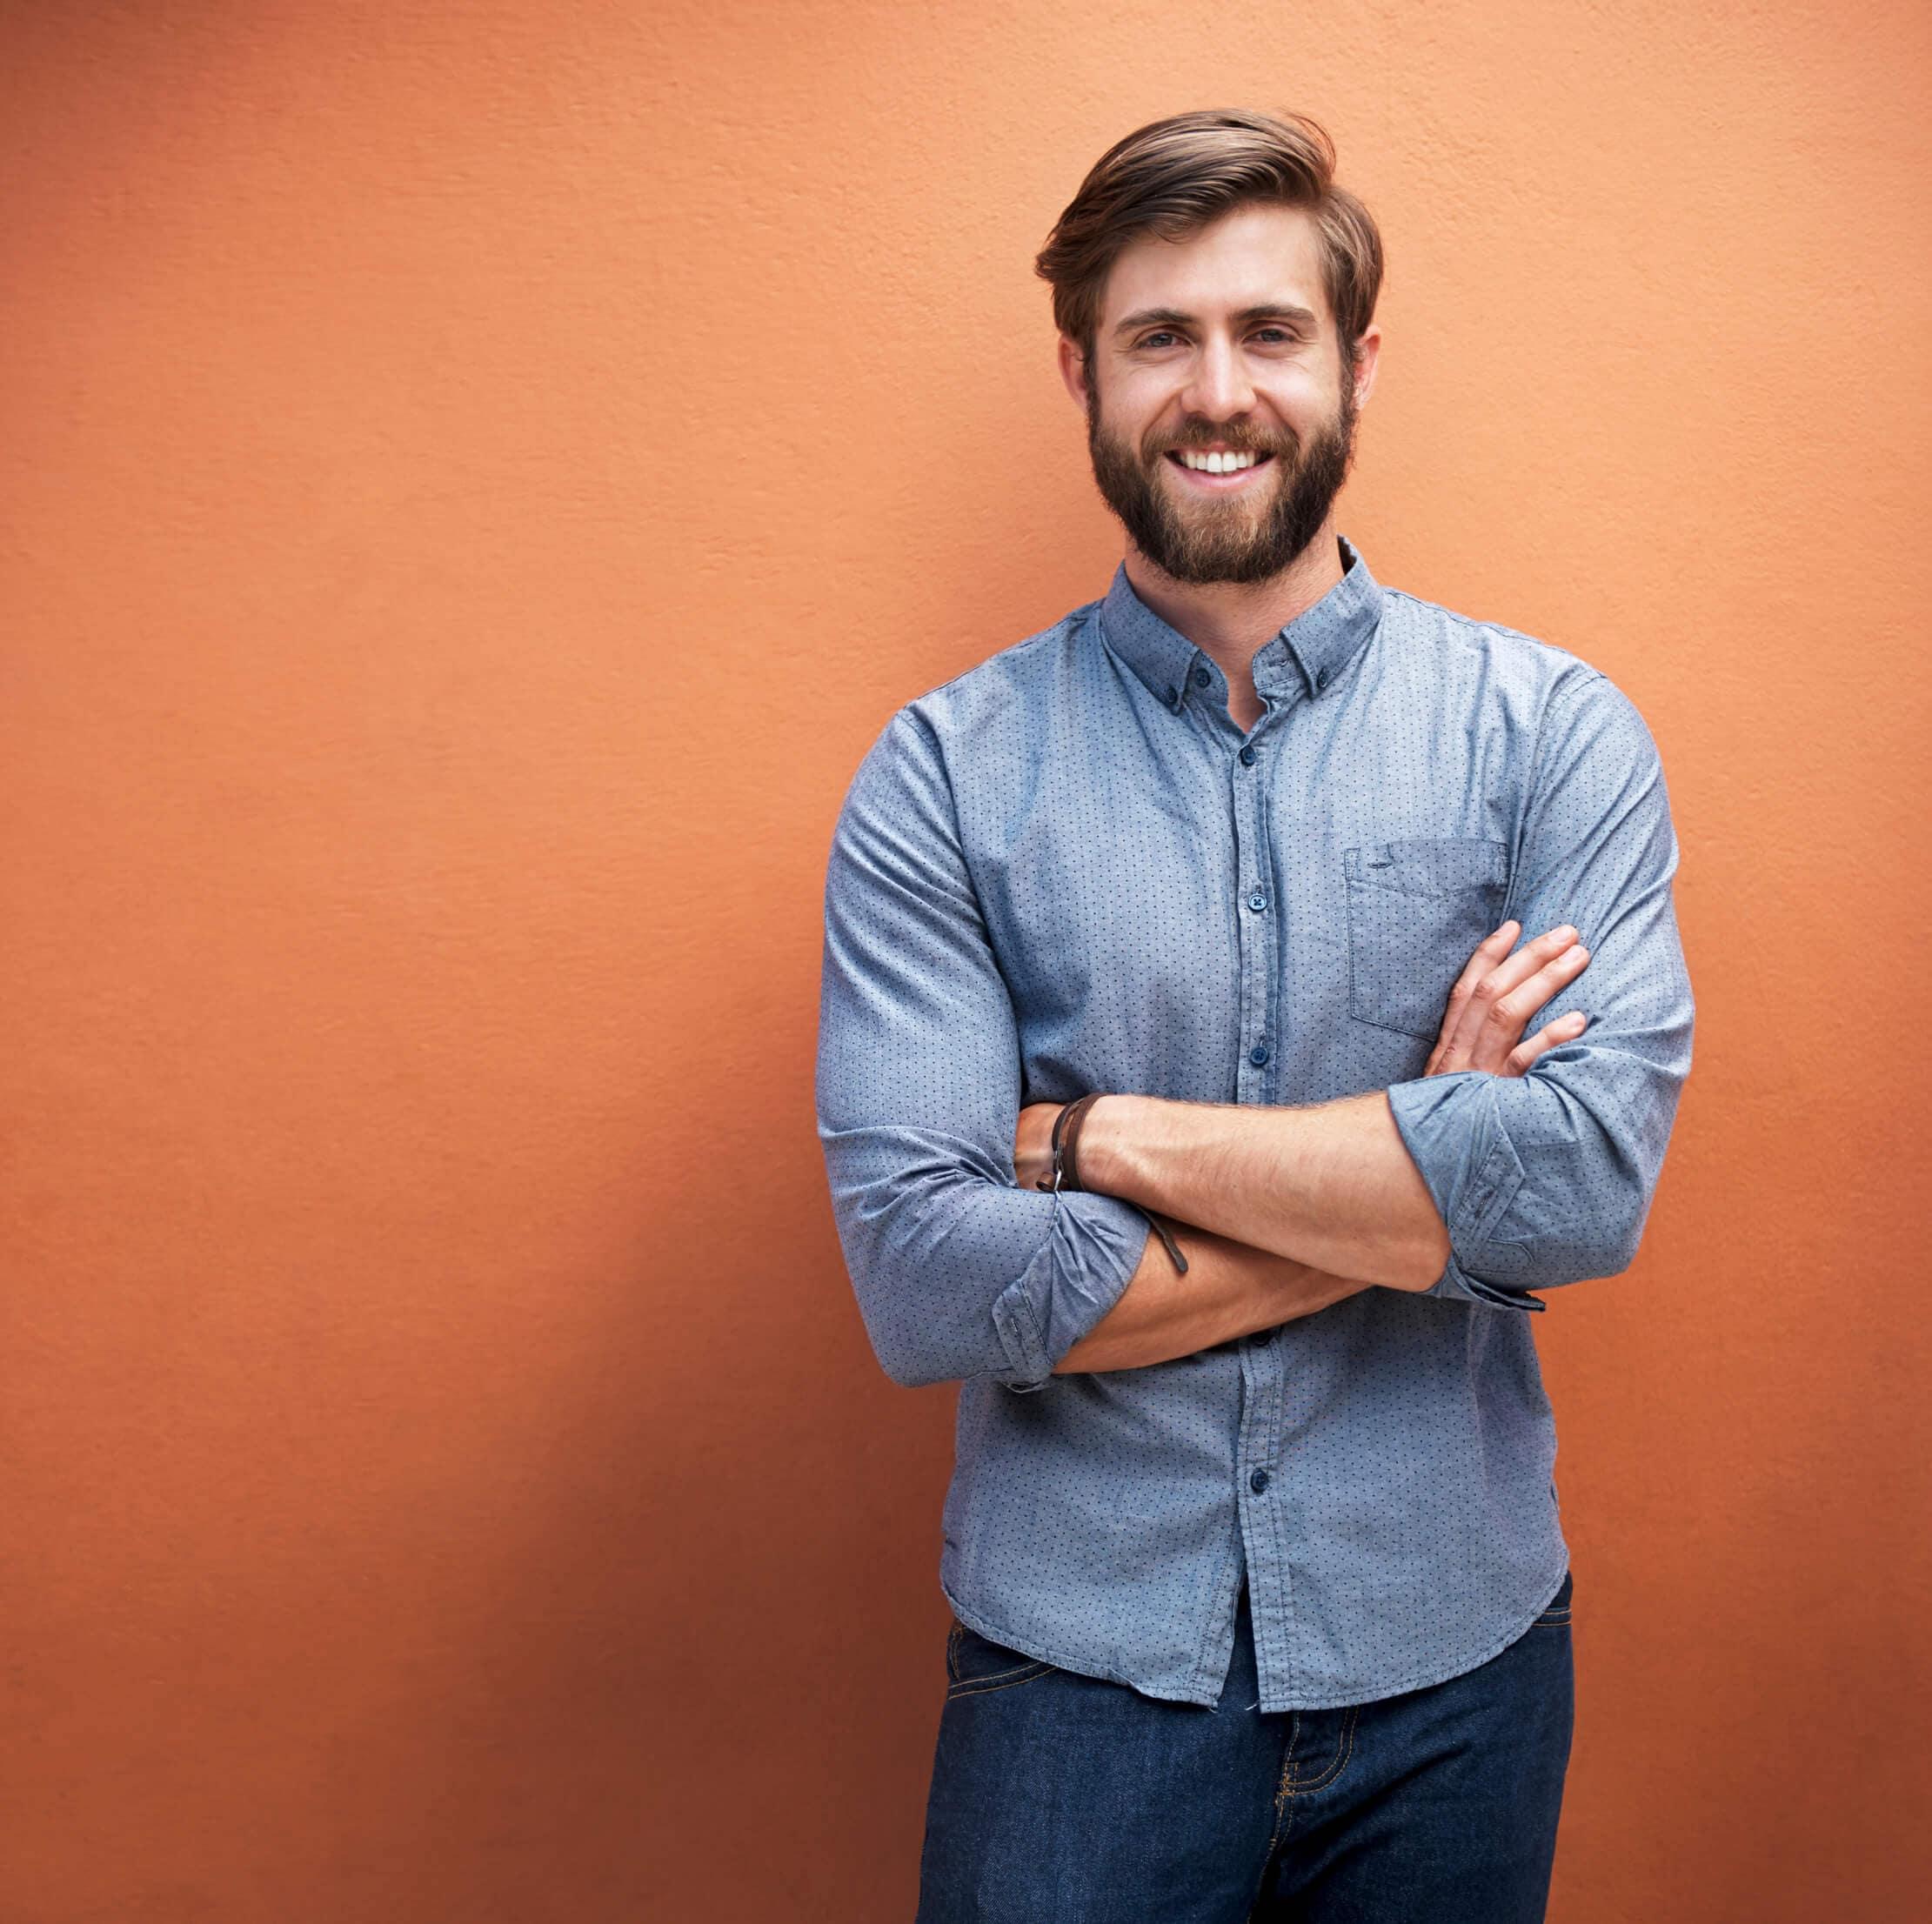 Freshen Up: 10 Best Short Haircuts for Men